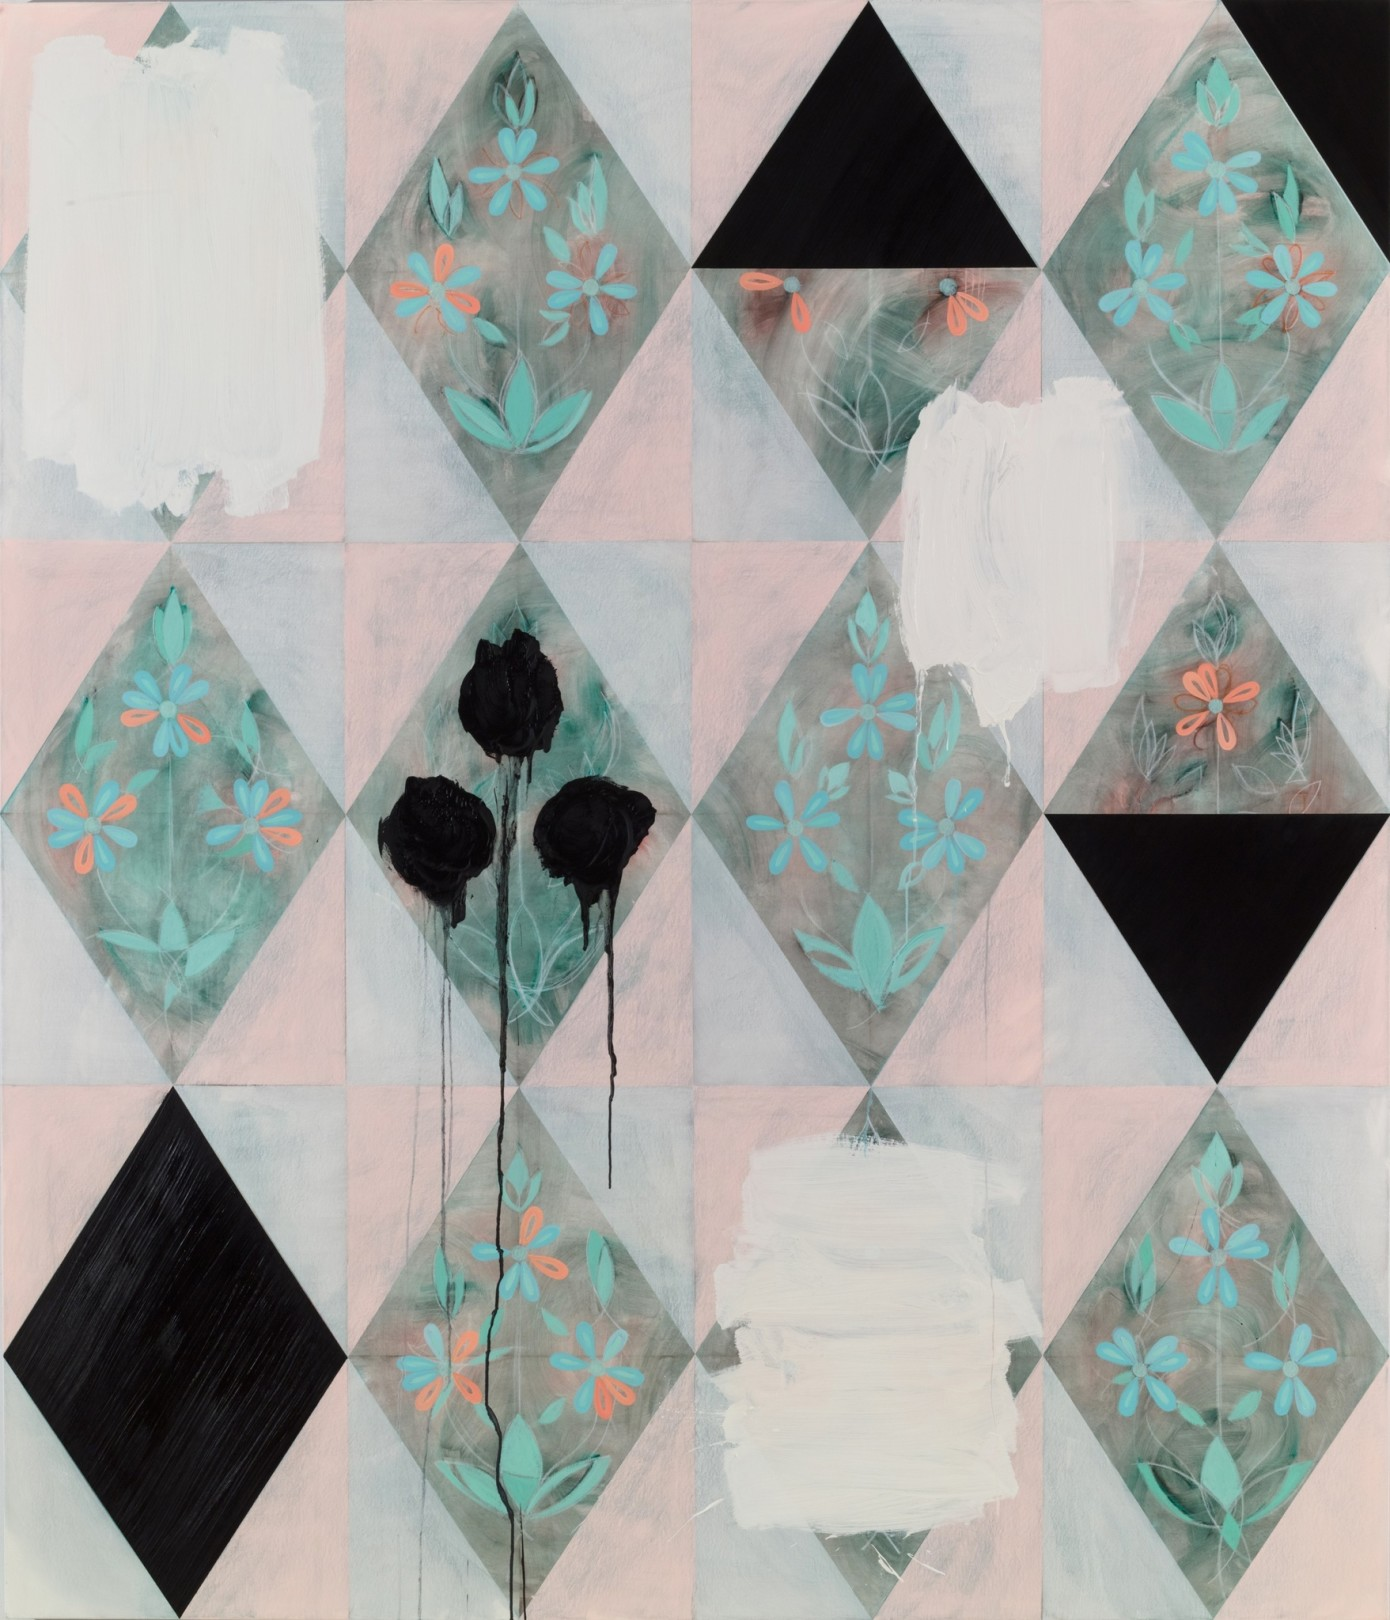 Kamrooz Aram, Untitled (Palimpsest #21), 2013-2014